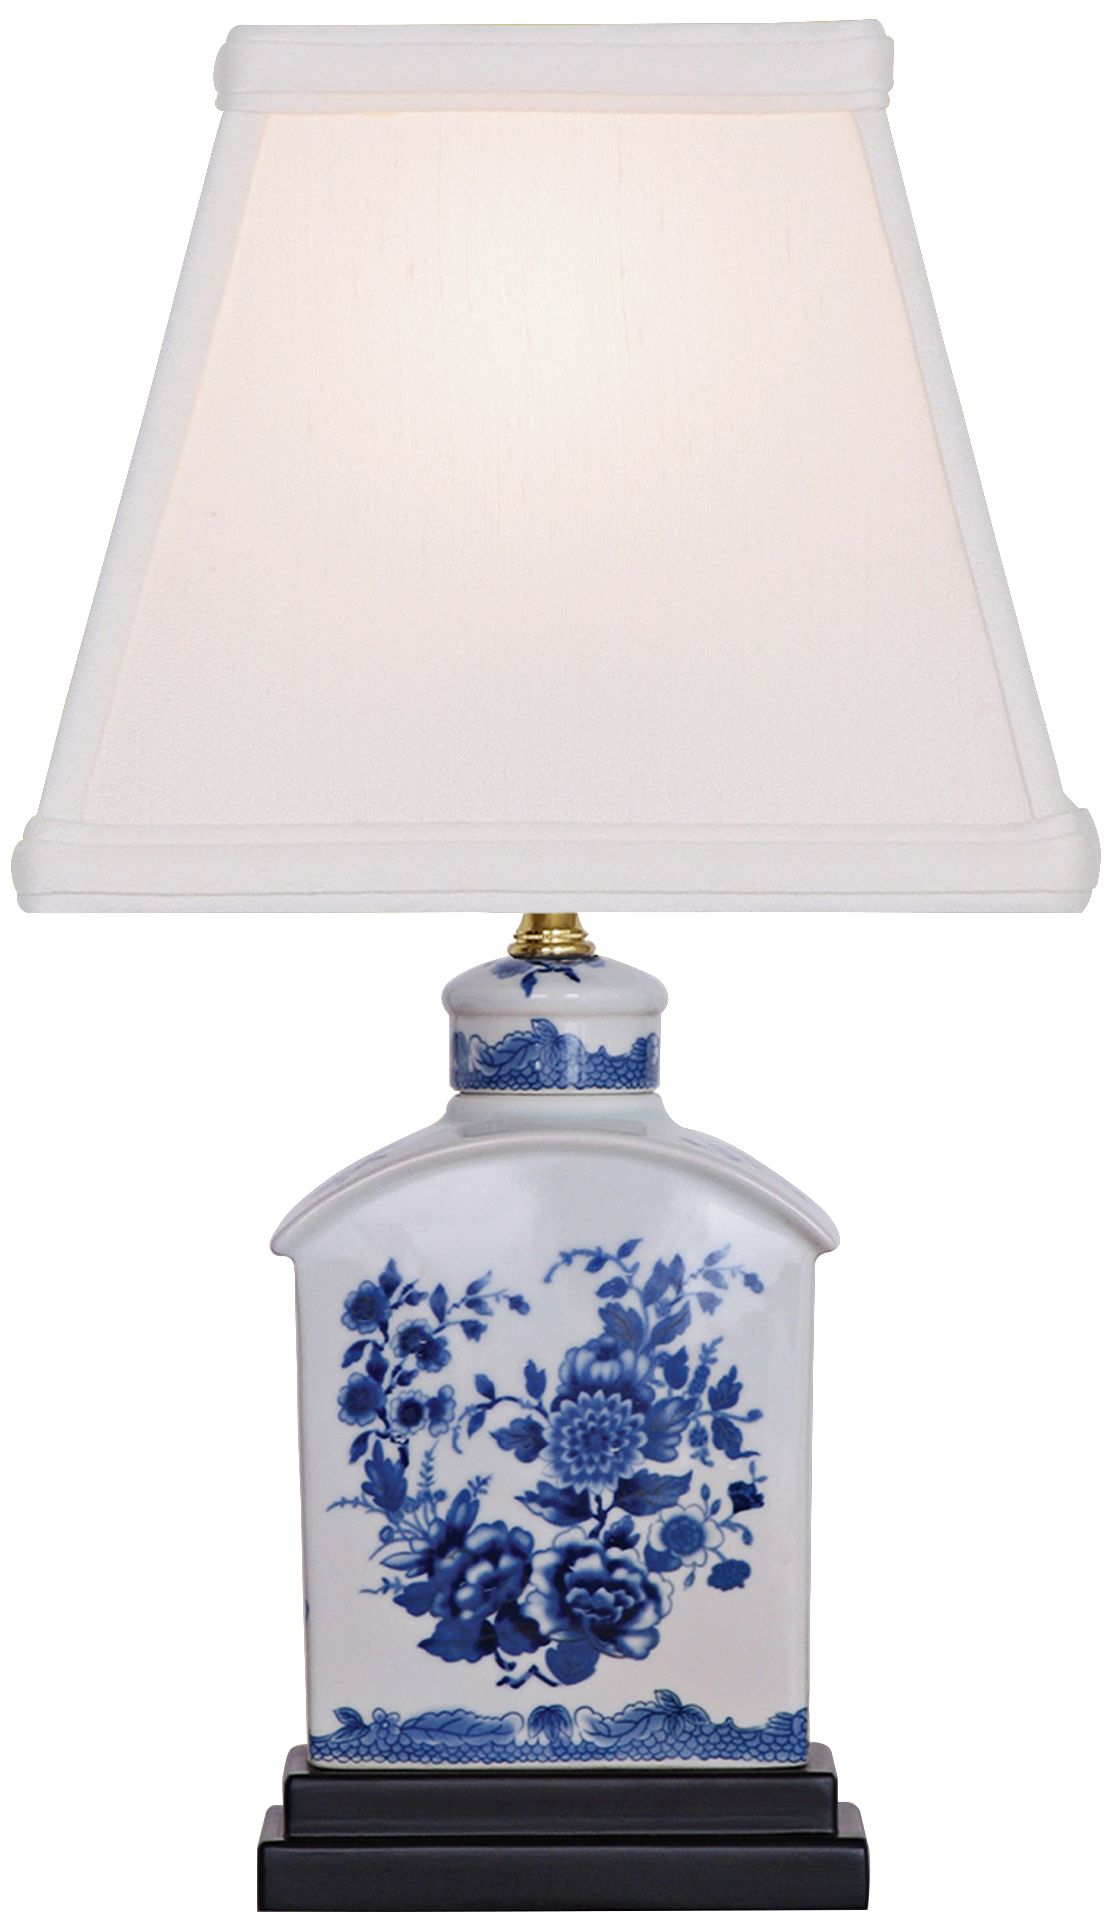 floral blue and white mini tea jar porcelain table lamp